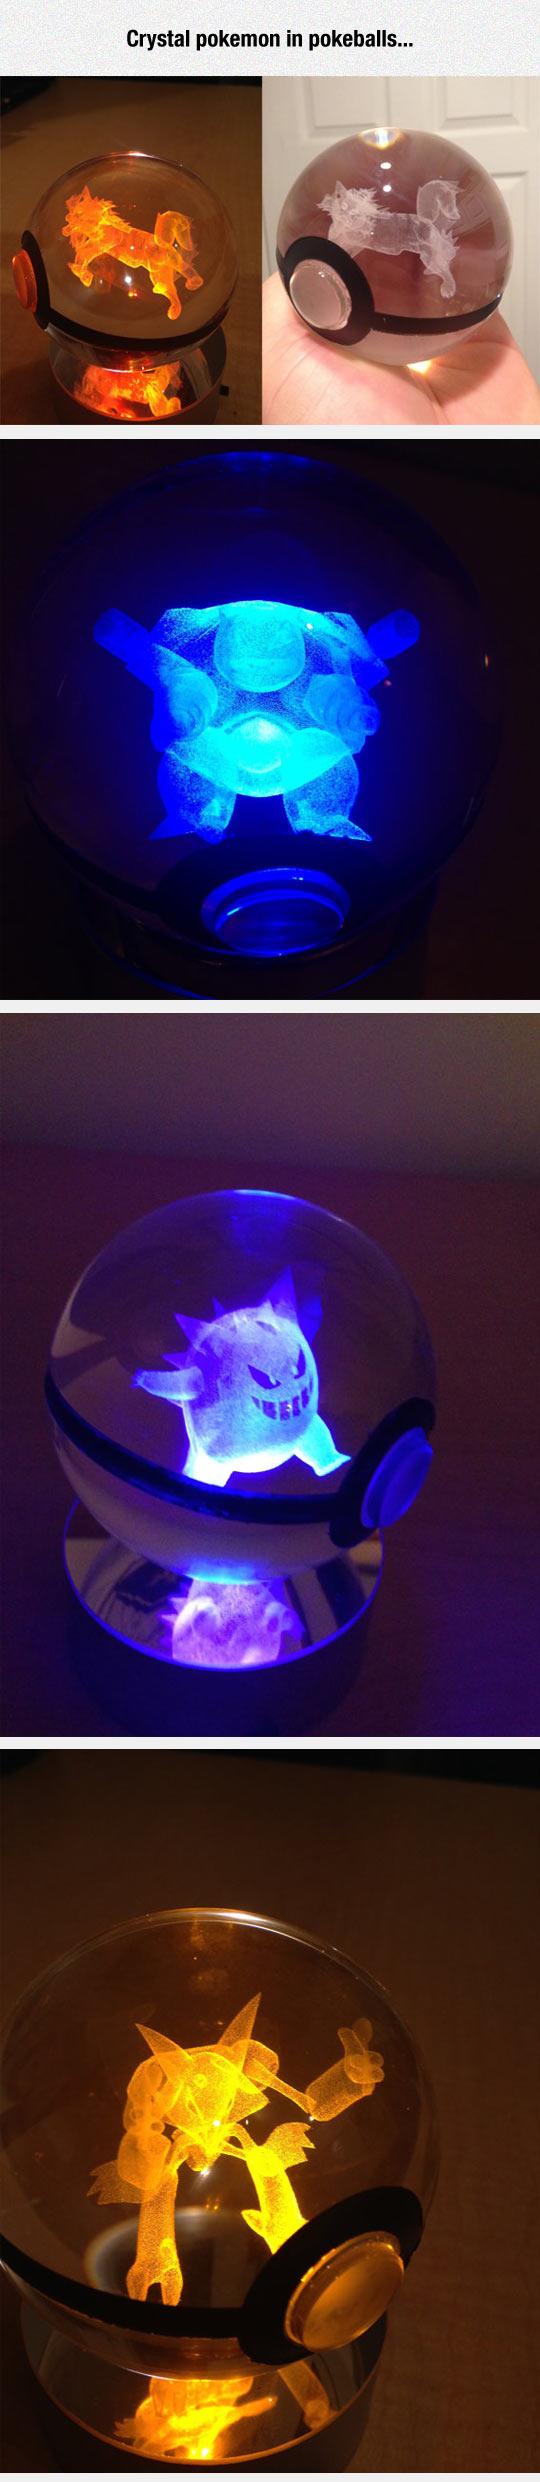 funny-crystal-Pokemon-Pokeballs-light